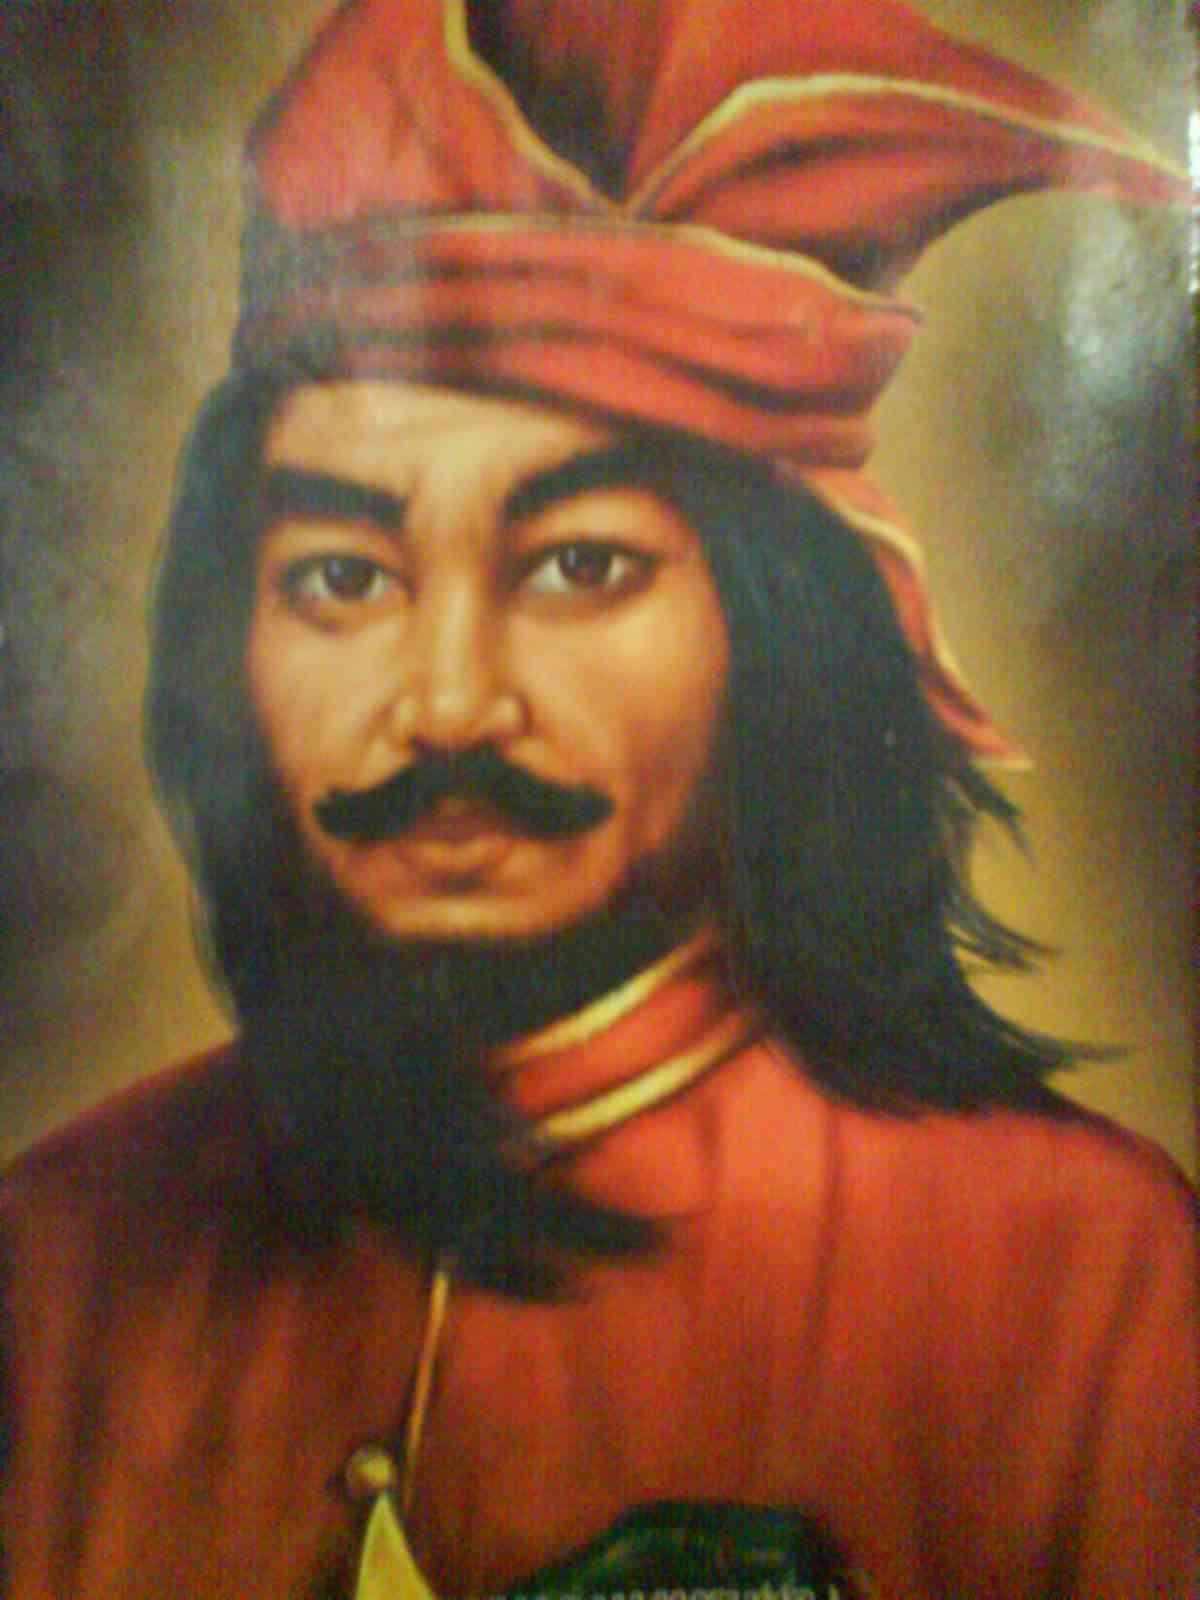 Sultan Hasanuddin The King Of Gowa